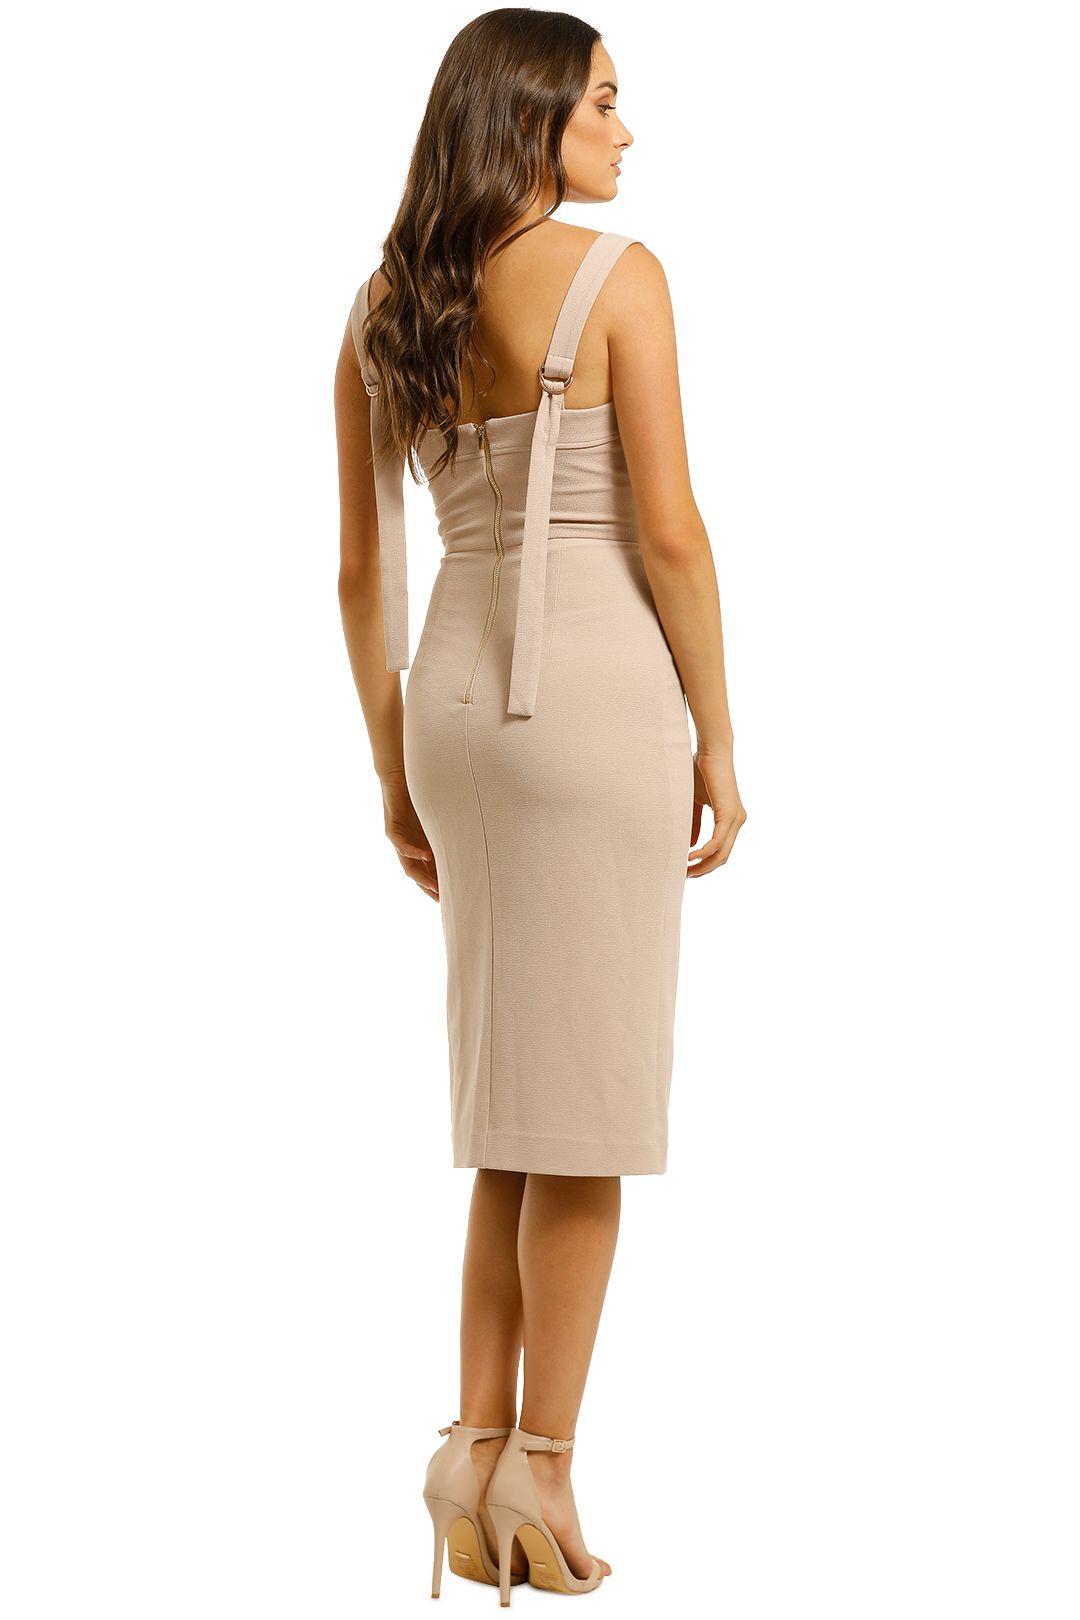 Rebecca-Vallance-Celestina-Tie-Dress-Nude-Back